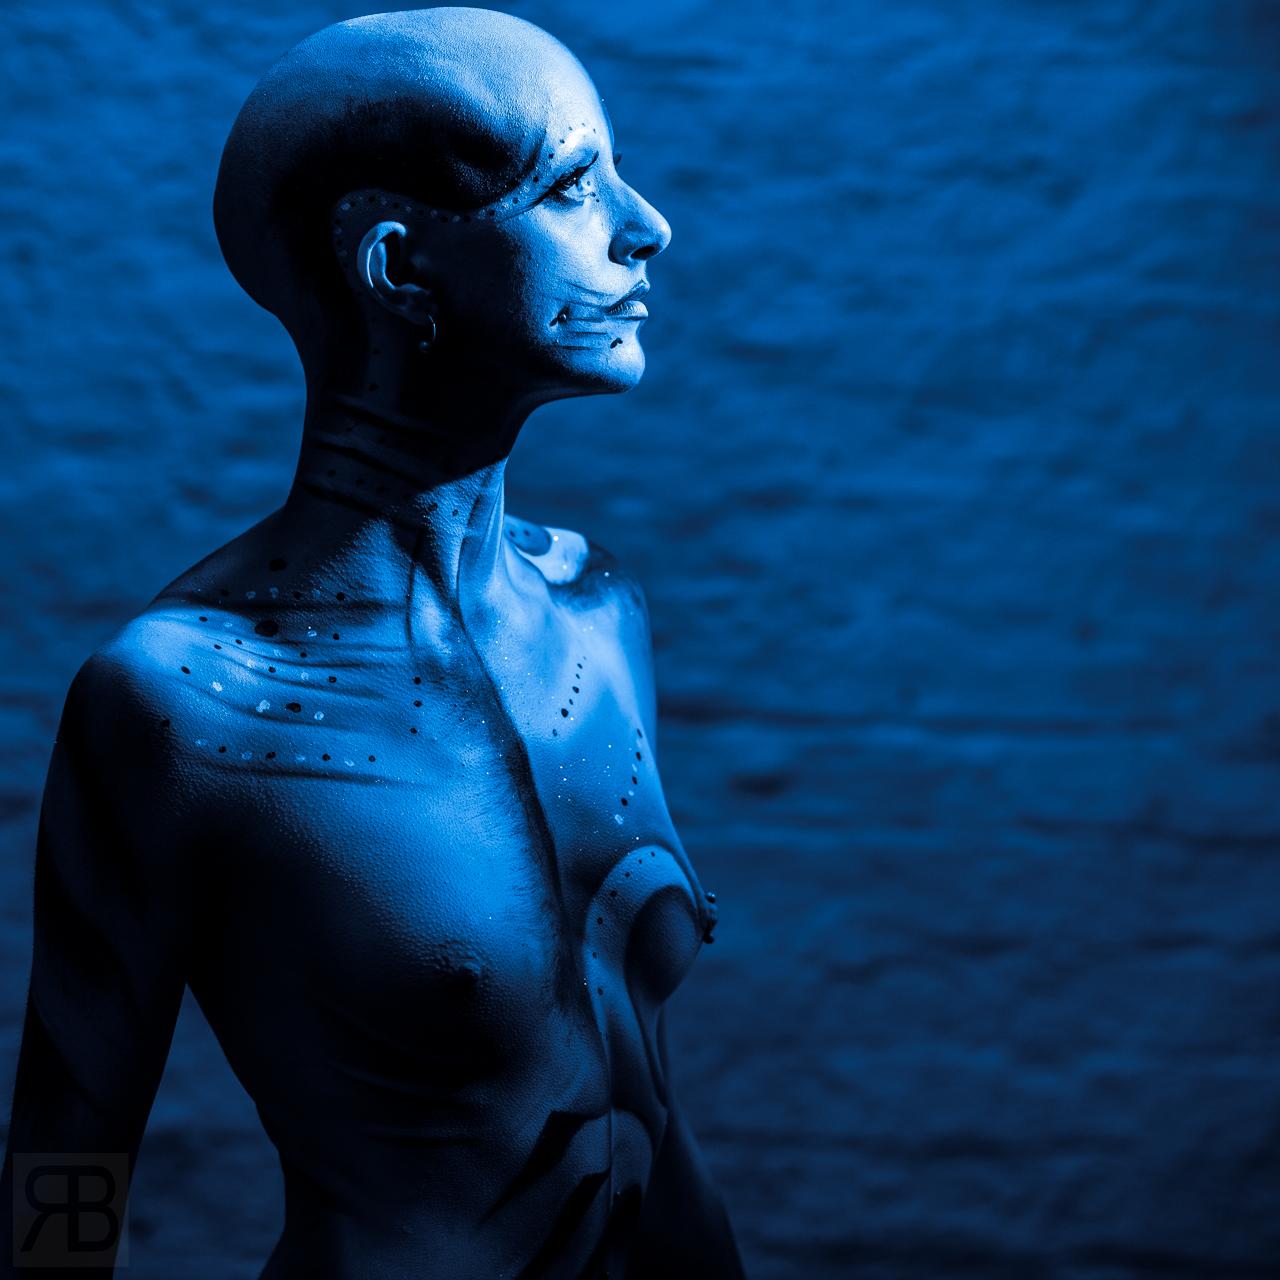 171113_AlienTerminator_AWOLStudios_5276058_WebWM.jpg